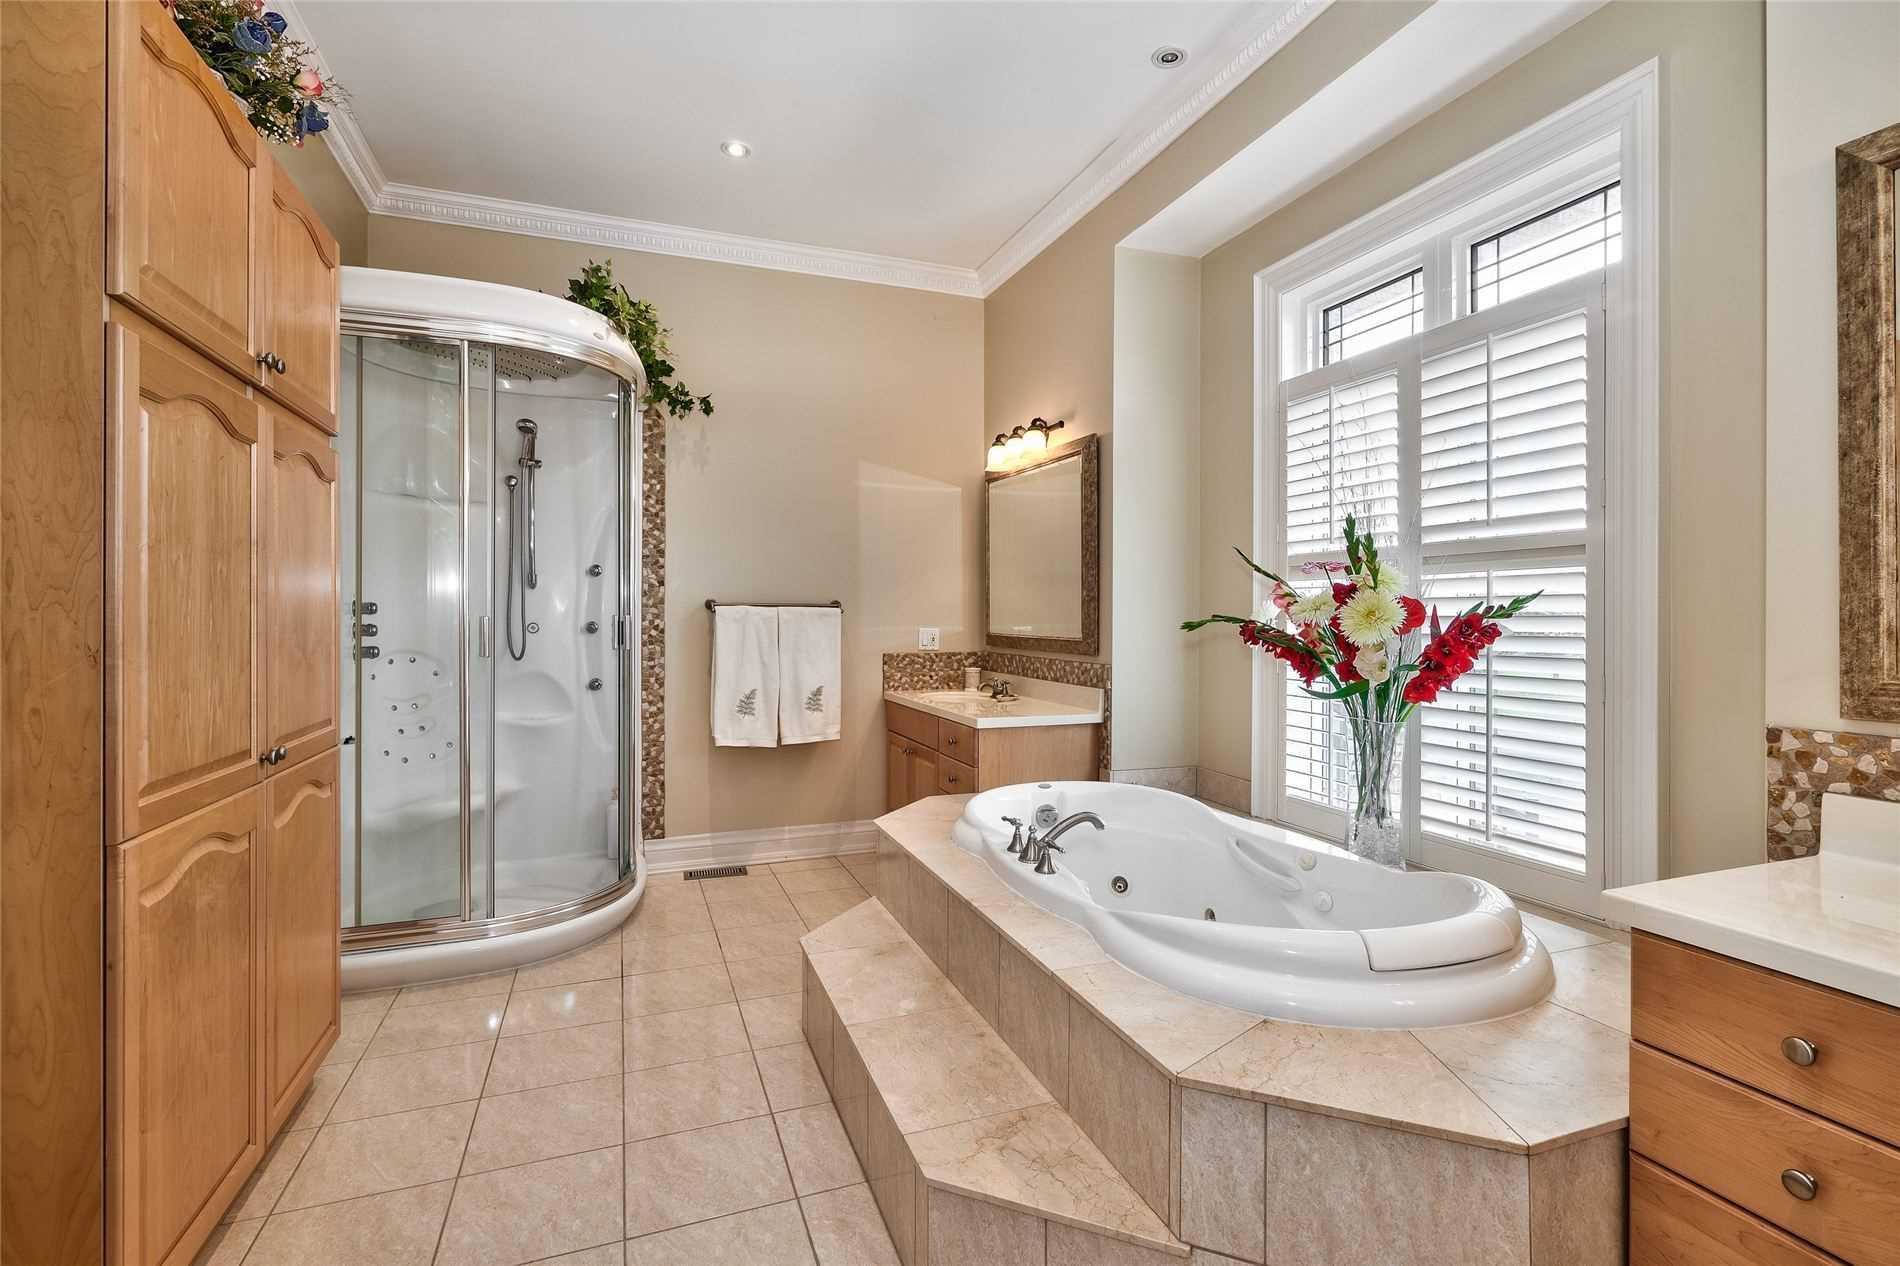 Detached house For Sale In Burlington - 5431 Appleby Line, Burlington, Ontario, Canada L7M0P3 , 4 Bedrooms Bedrooms, ,6 BathroomsBathrooms,Detached,For Sale,Appleby